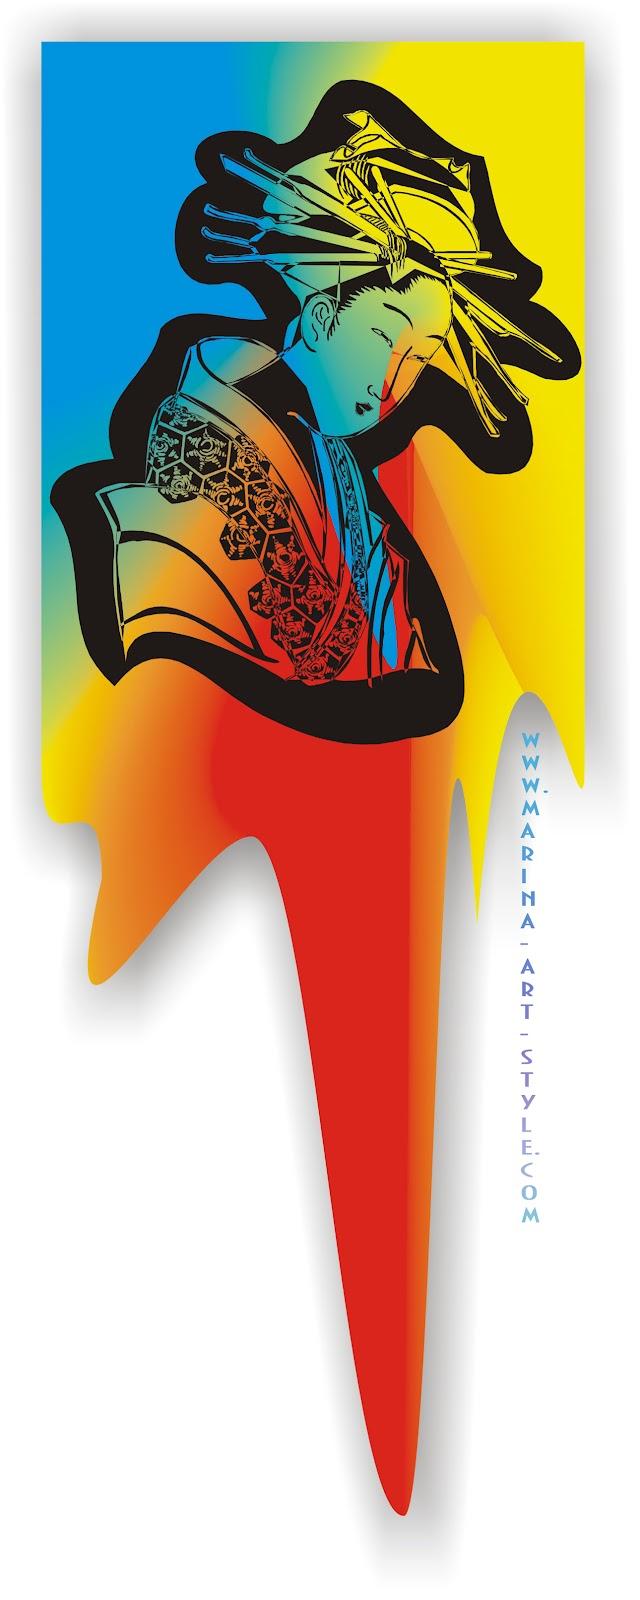 Аватар – изображение, иногда юзерпик ...: www.marina-art-style.com/2012/07/coreldraw-x3.html